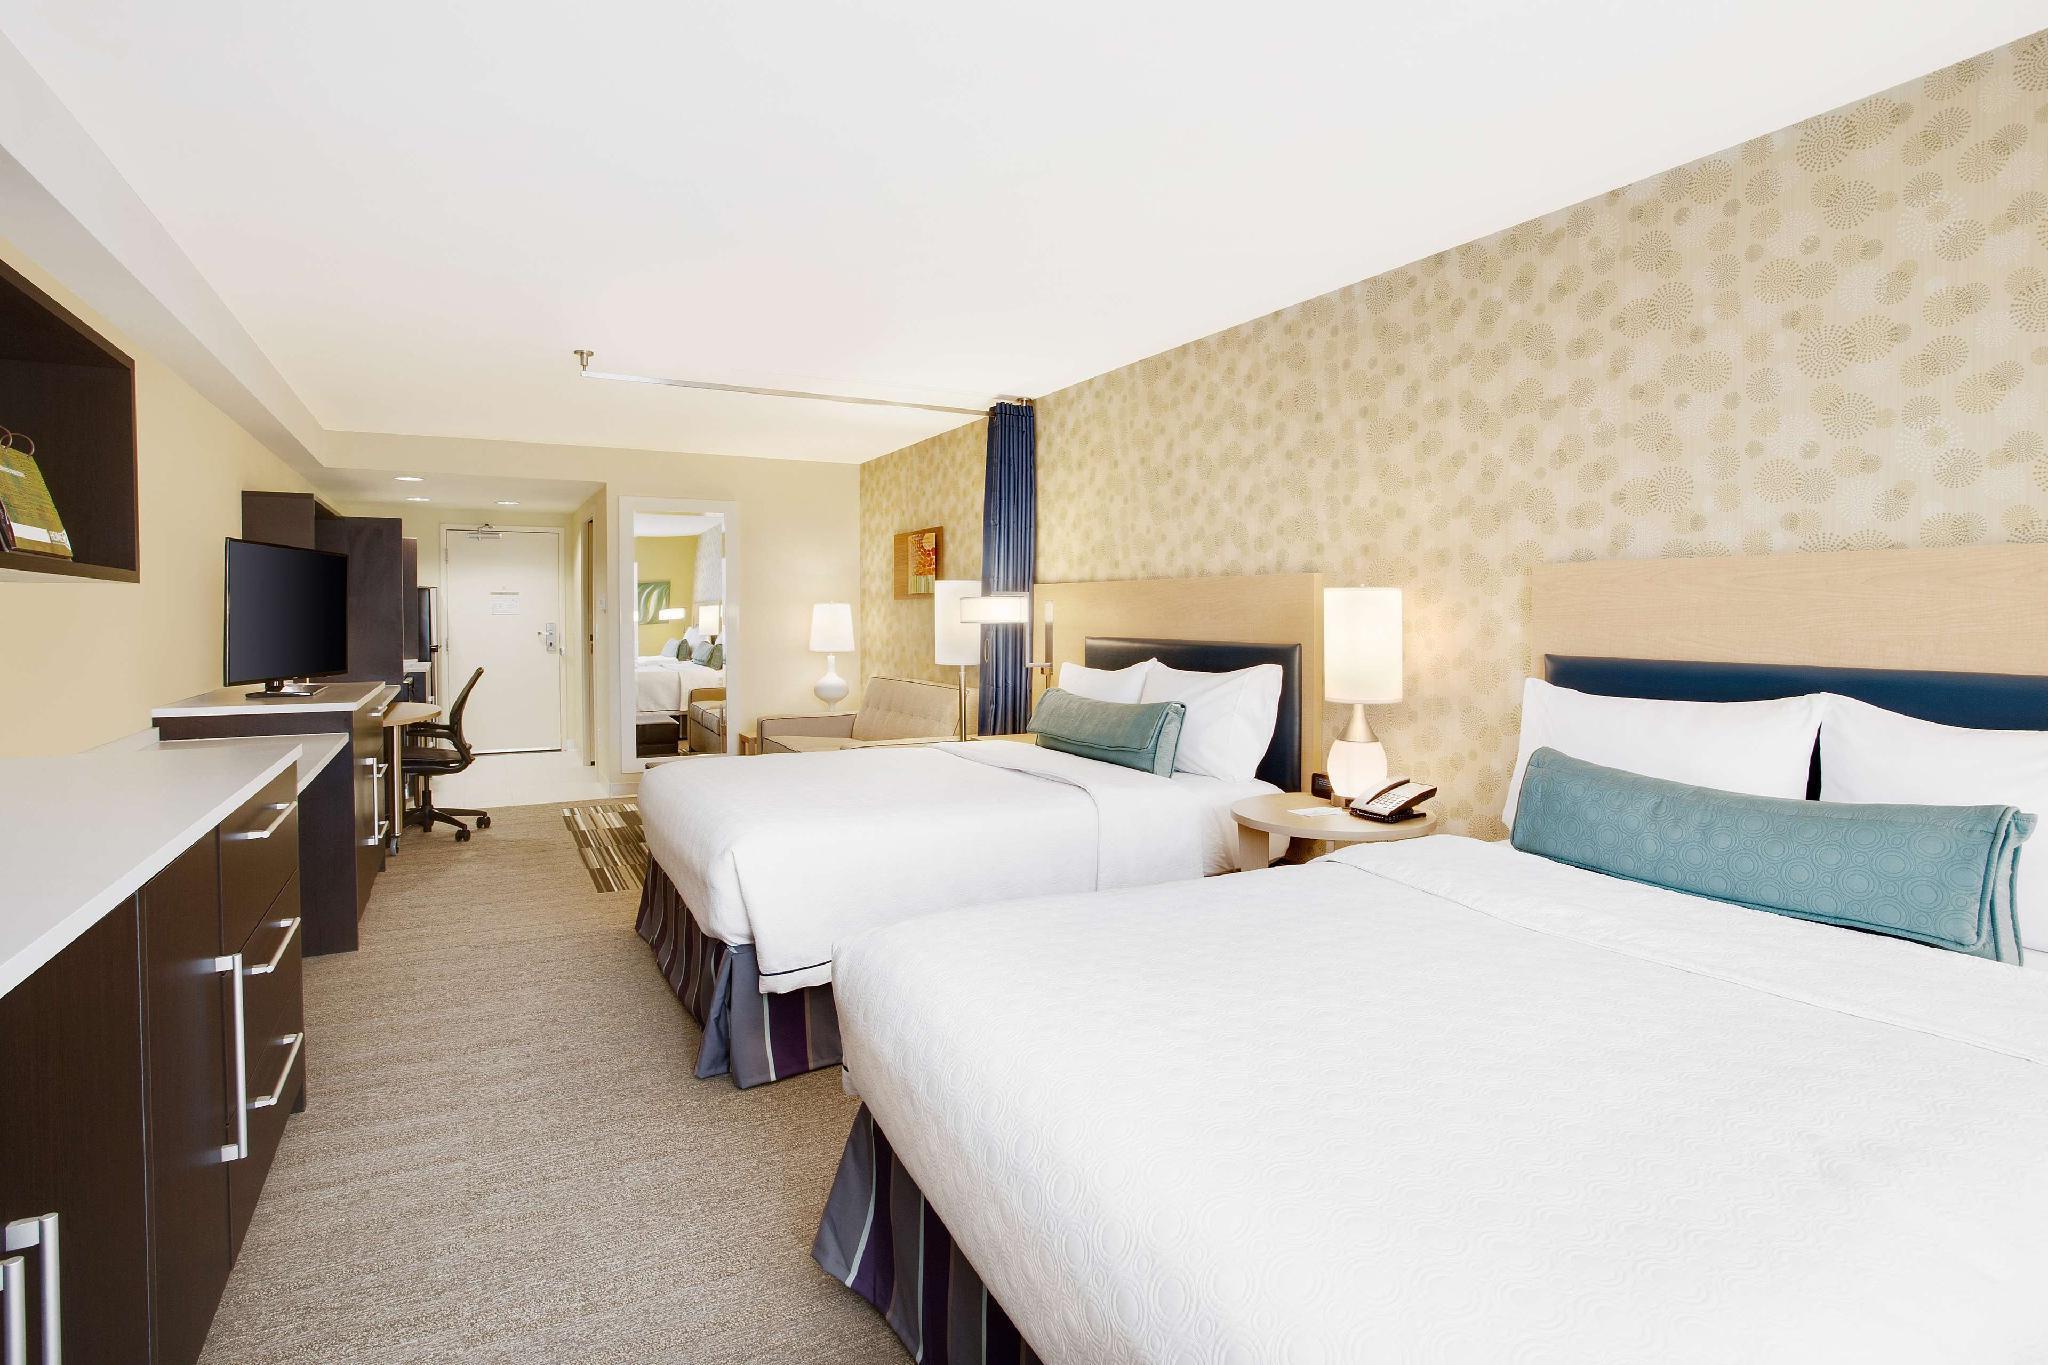 Home2 Suites By Hilton Chicago Schaumburg